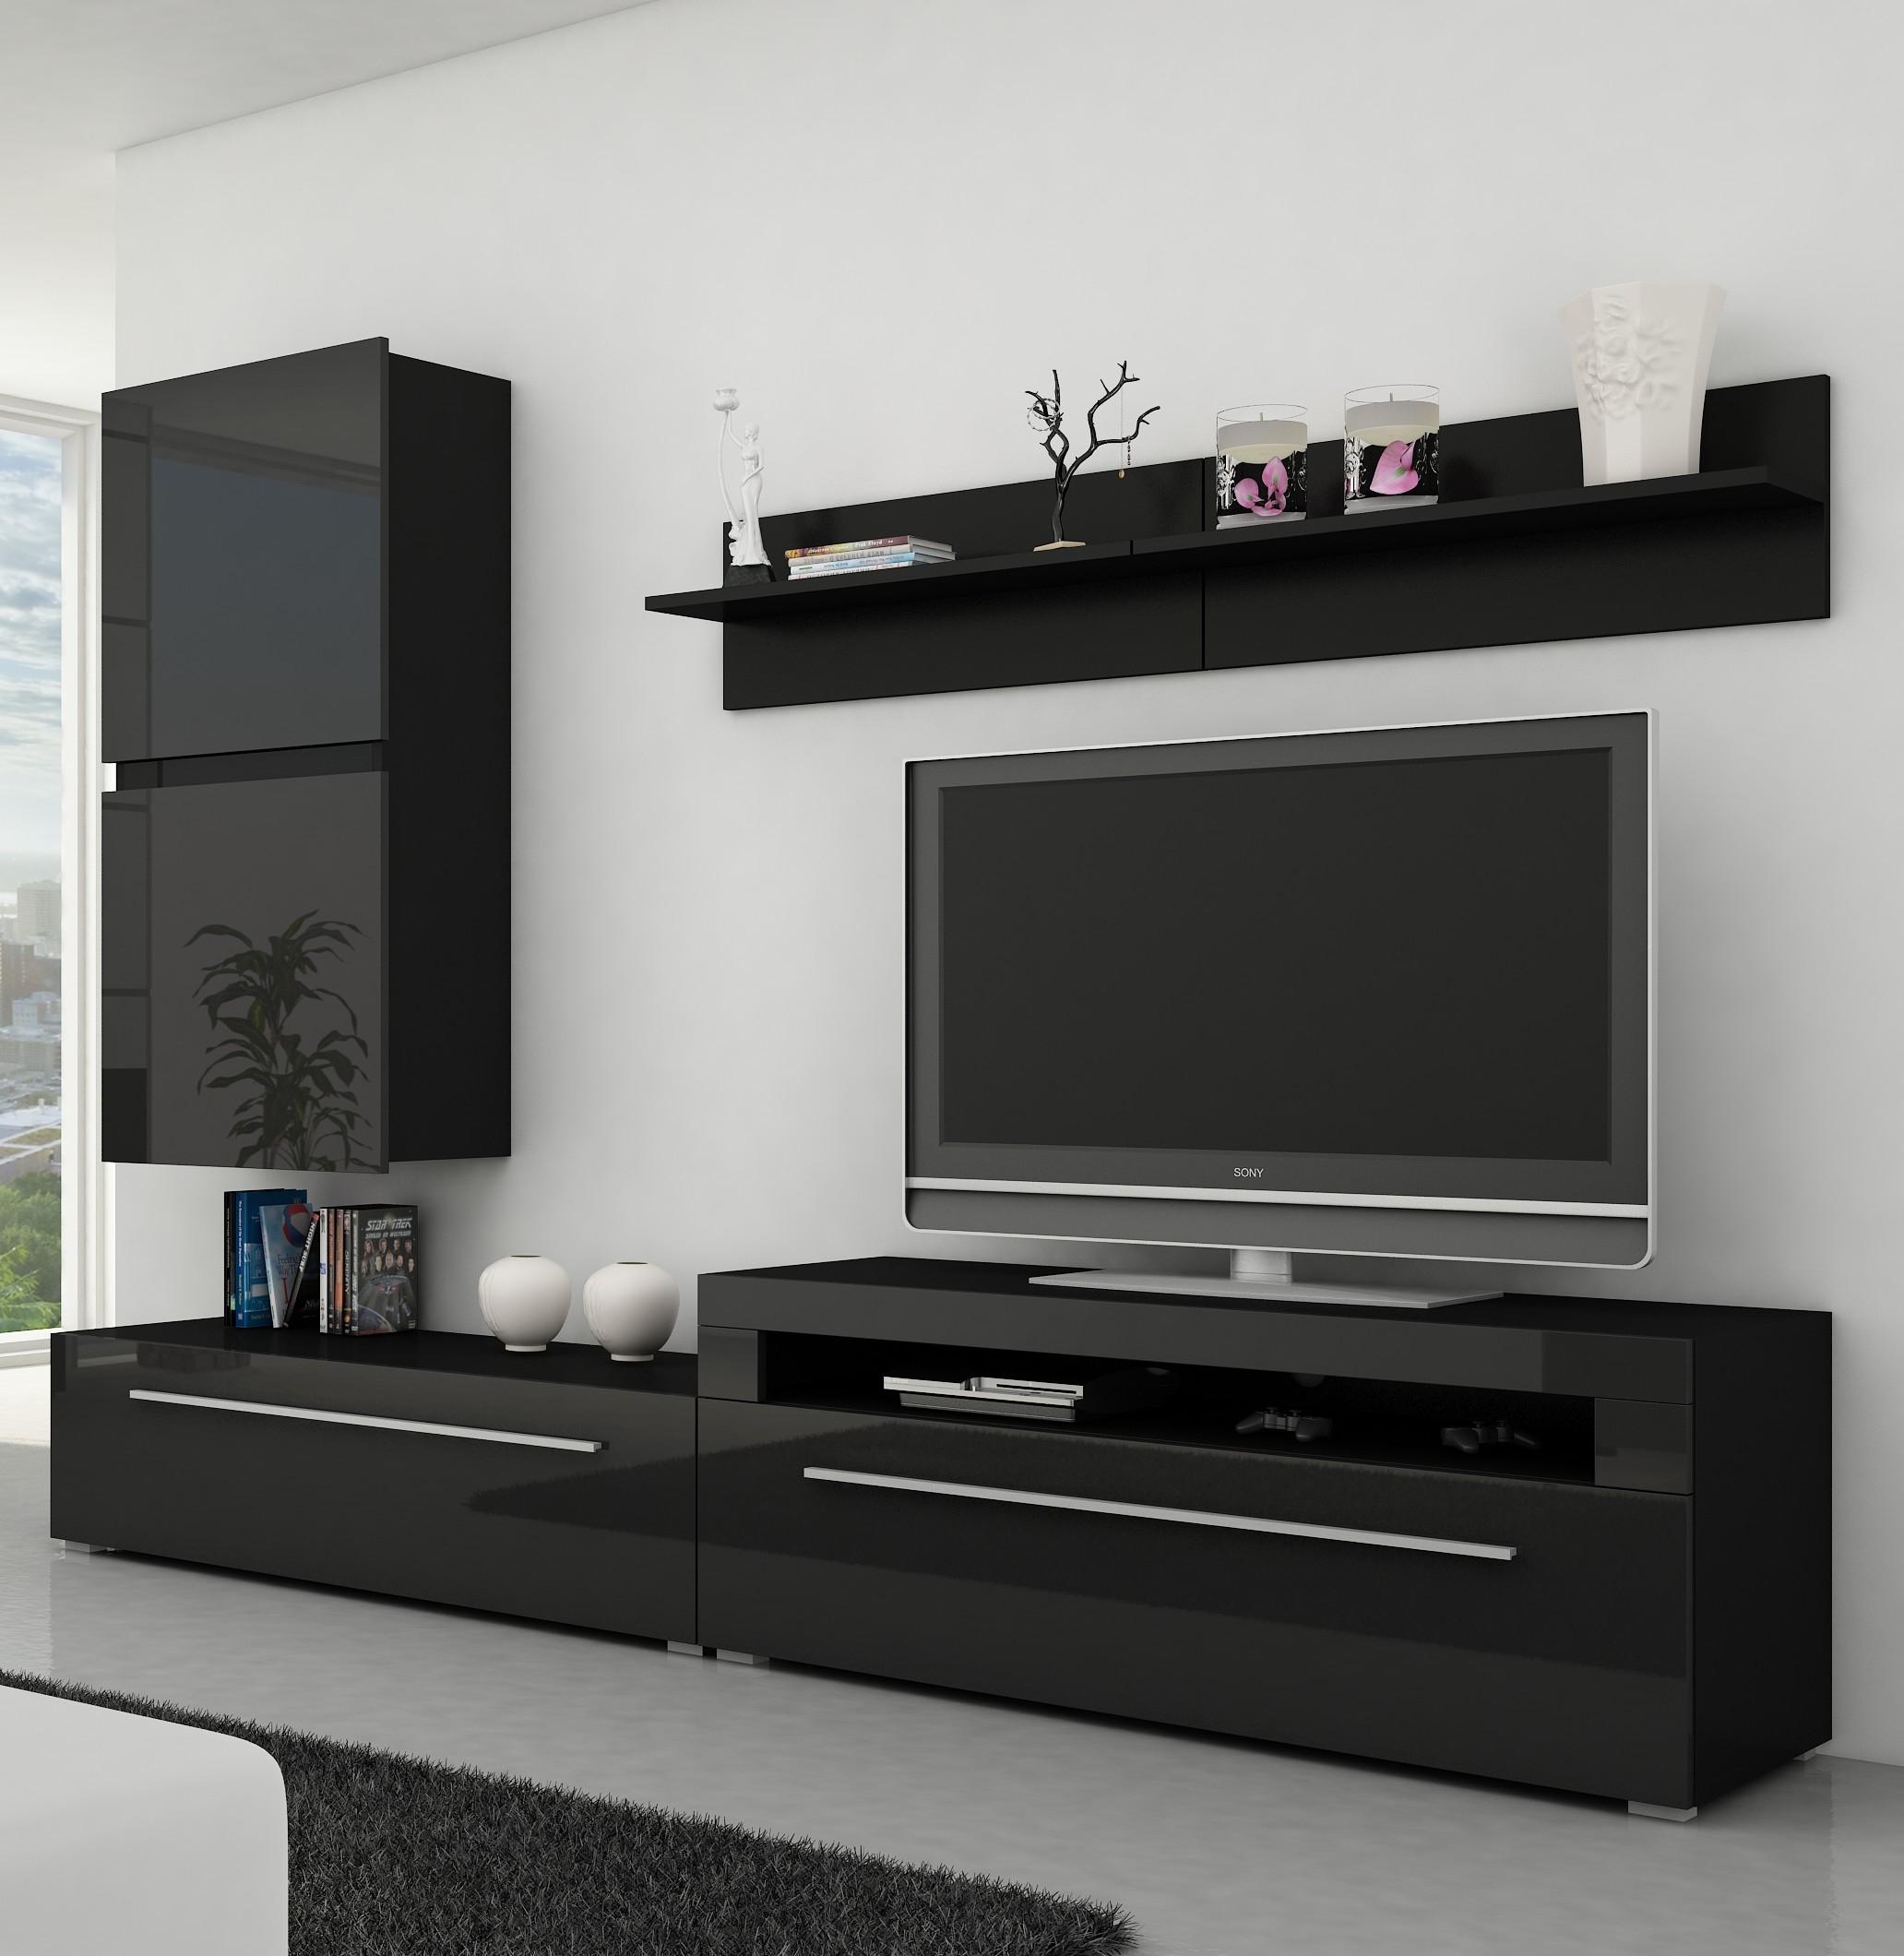 moebel24 pl wohnwand bonn hochglanz mit beleuchtung ebay. Black Bedroom Furniture Sets. Home Design Ideas